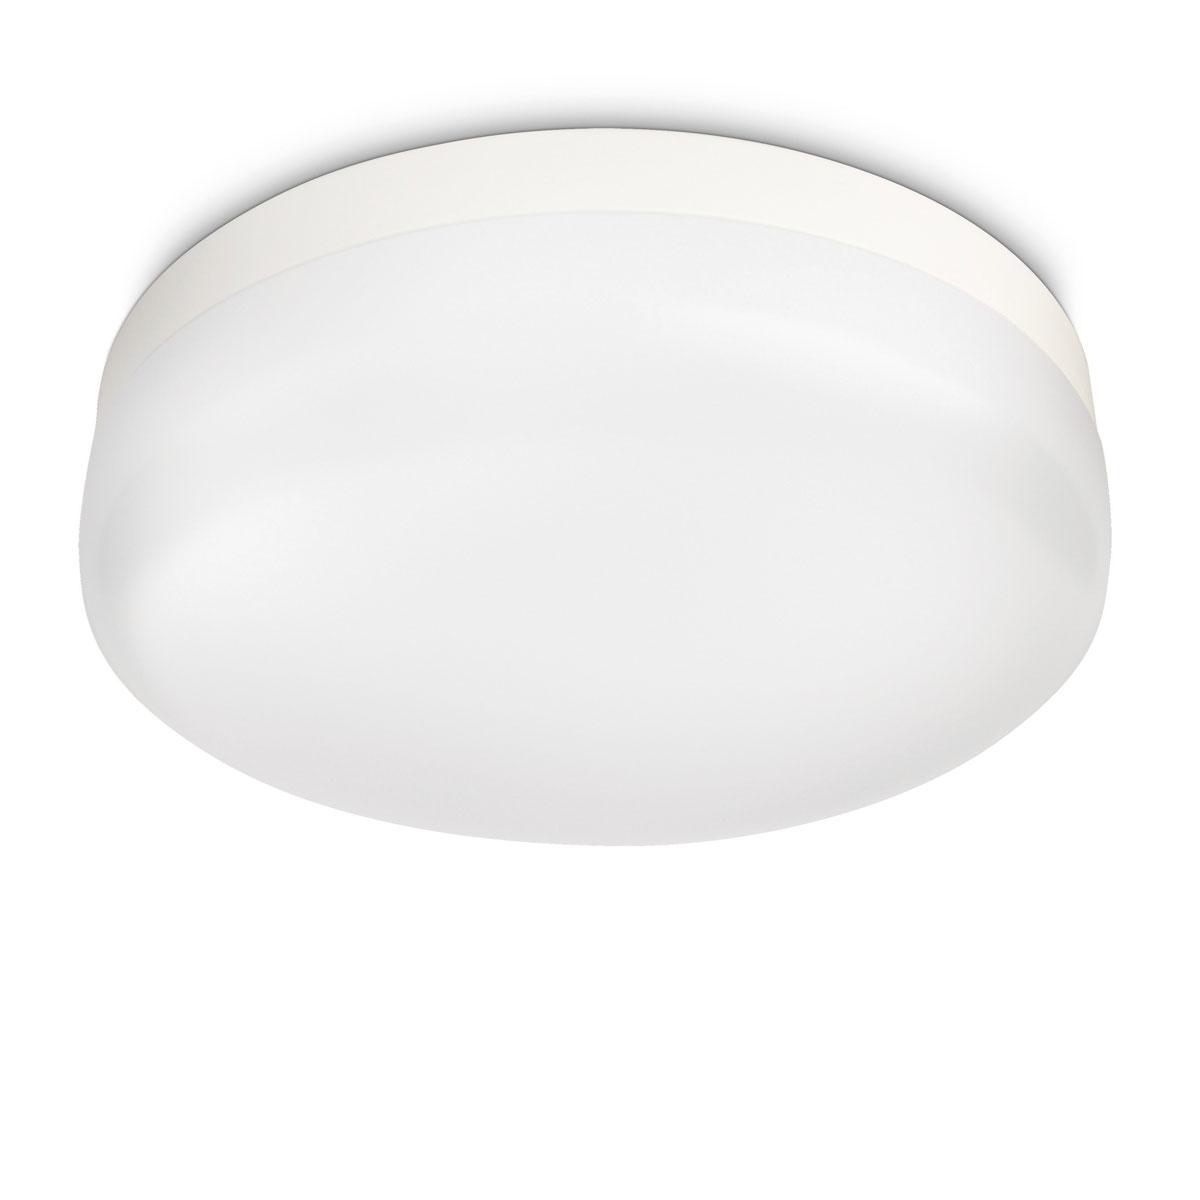 philips mybathroom baume plafondlamp wit. Black Bedroom Furniture Sets. Home Design Ideas